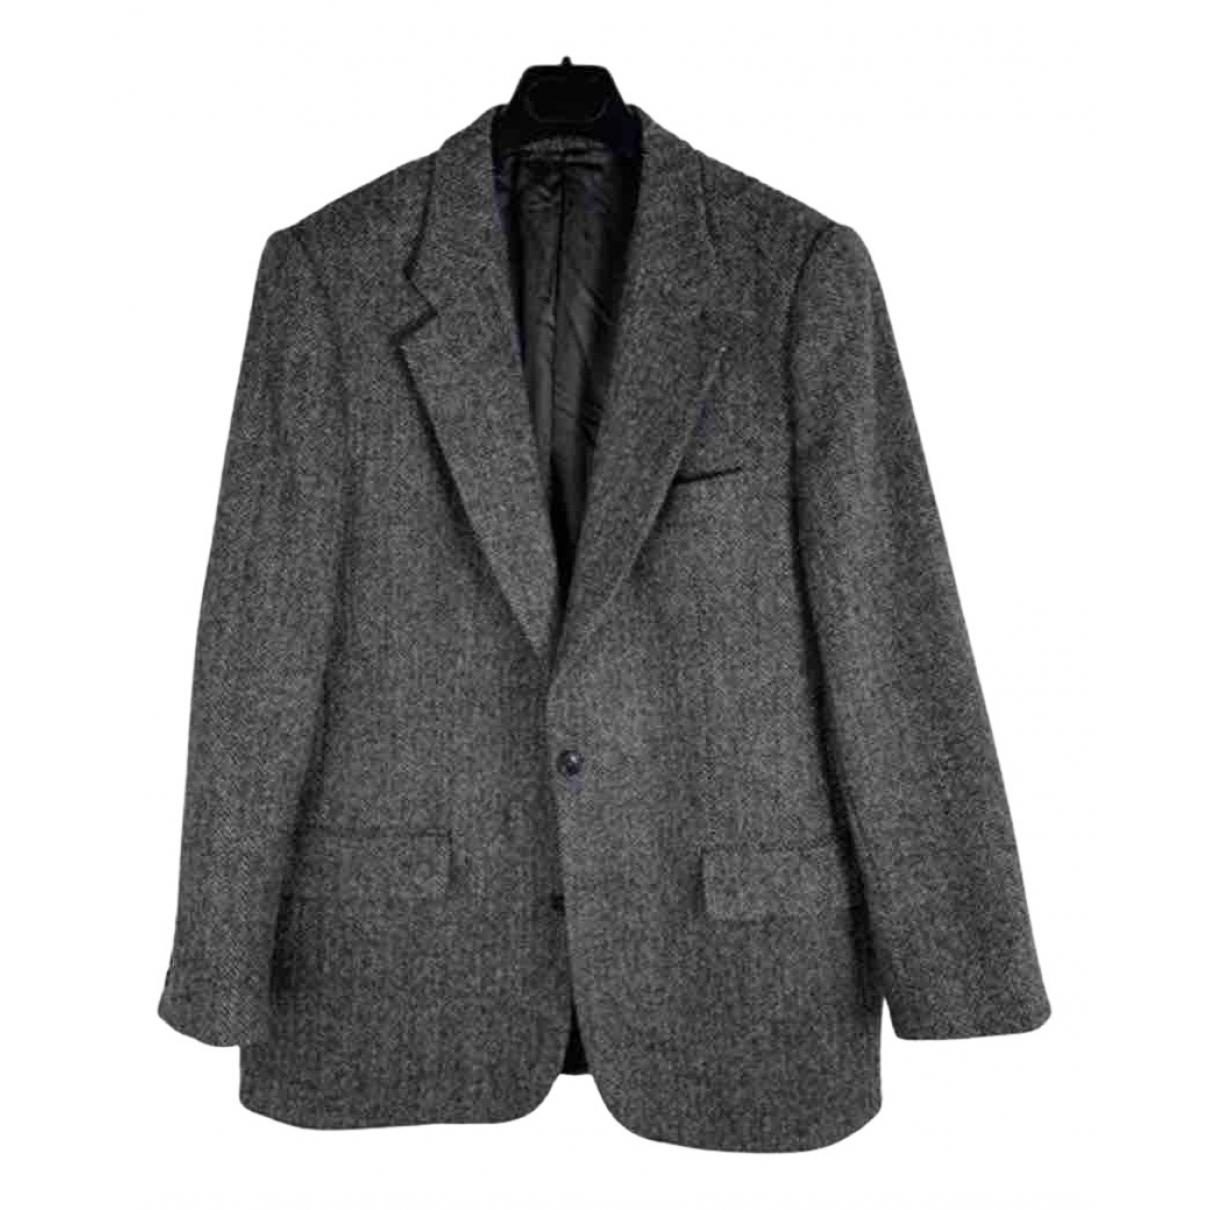 Harris \N Grey Wool jacket  for Men 52 IT